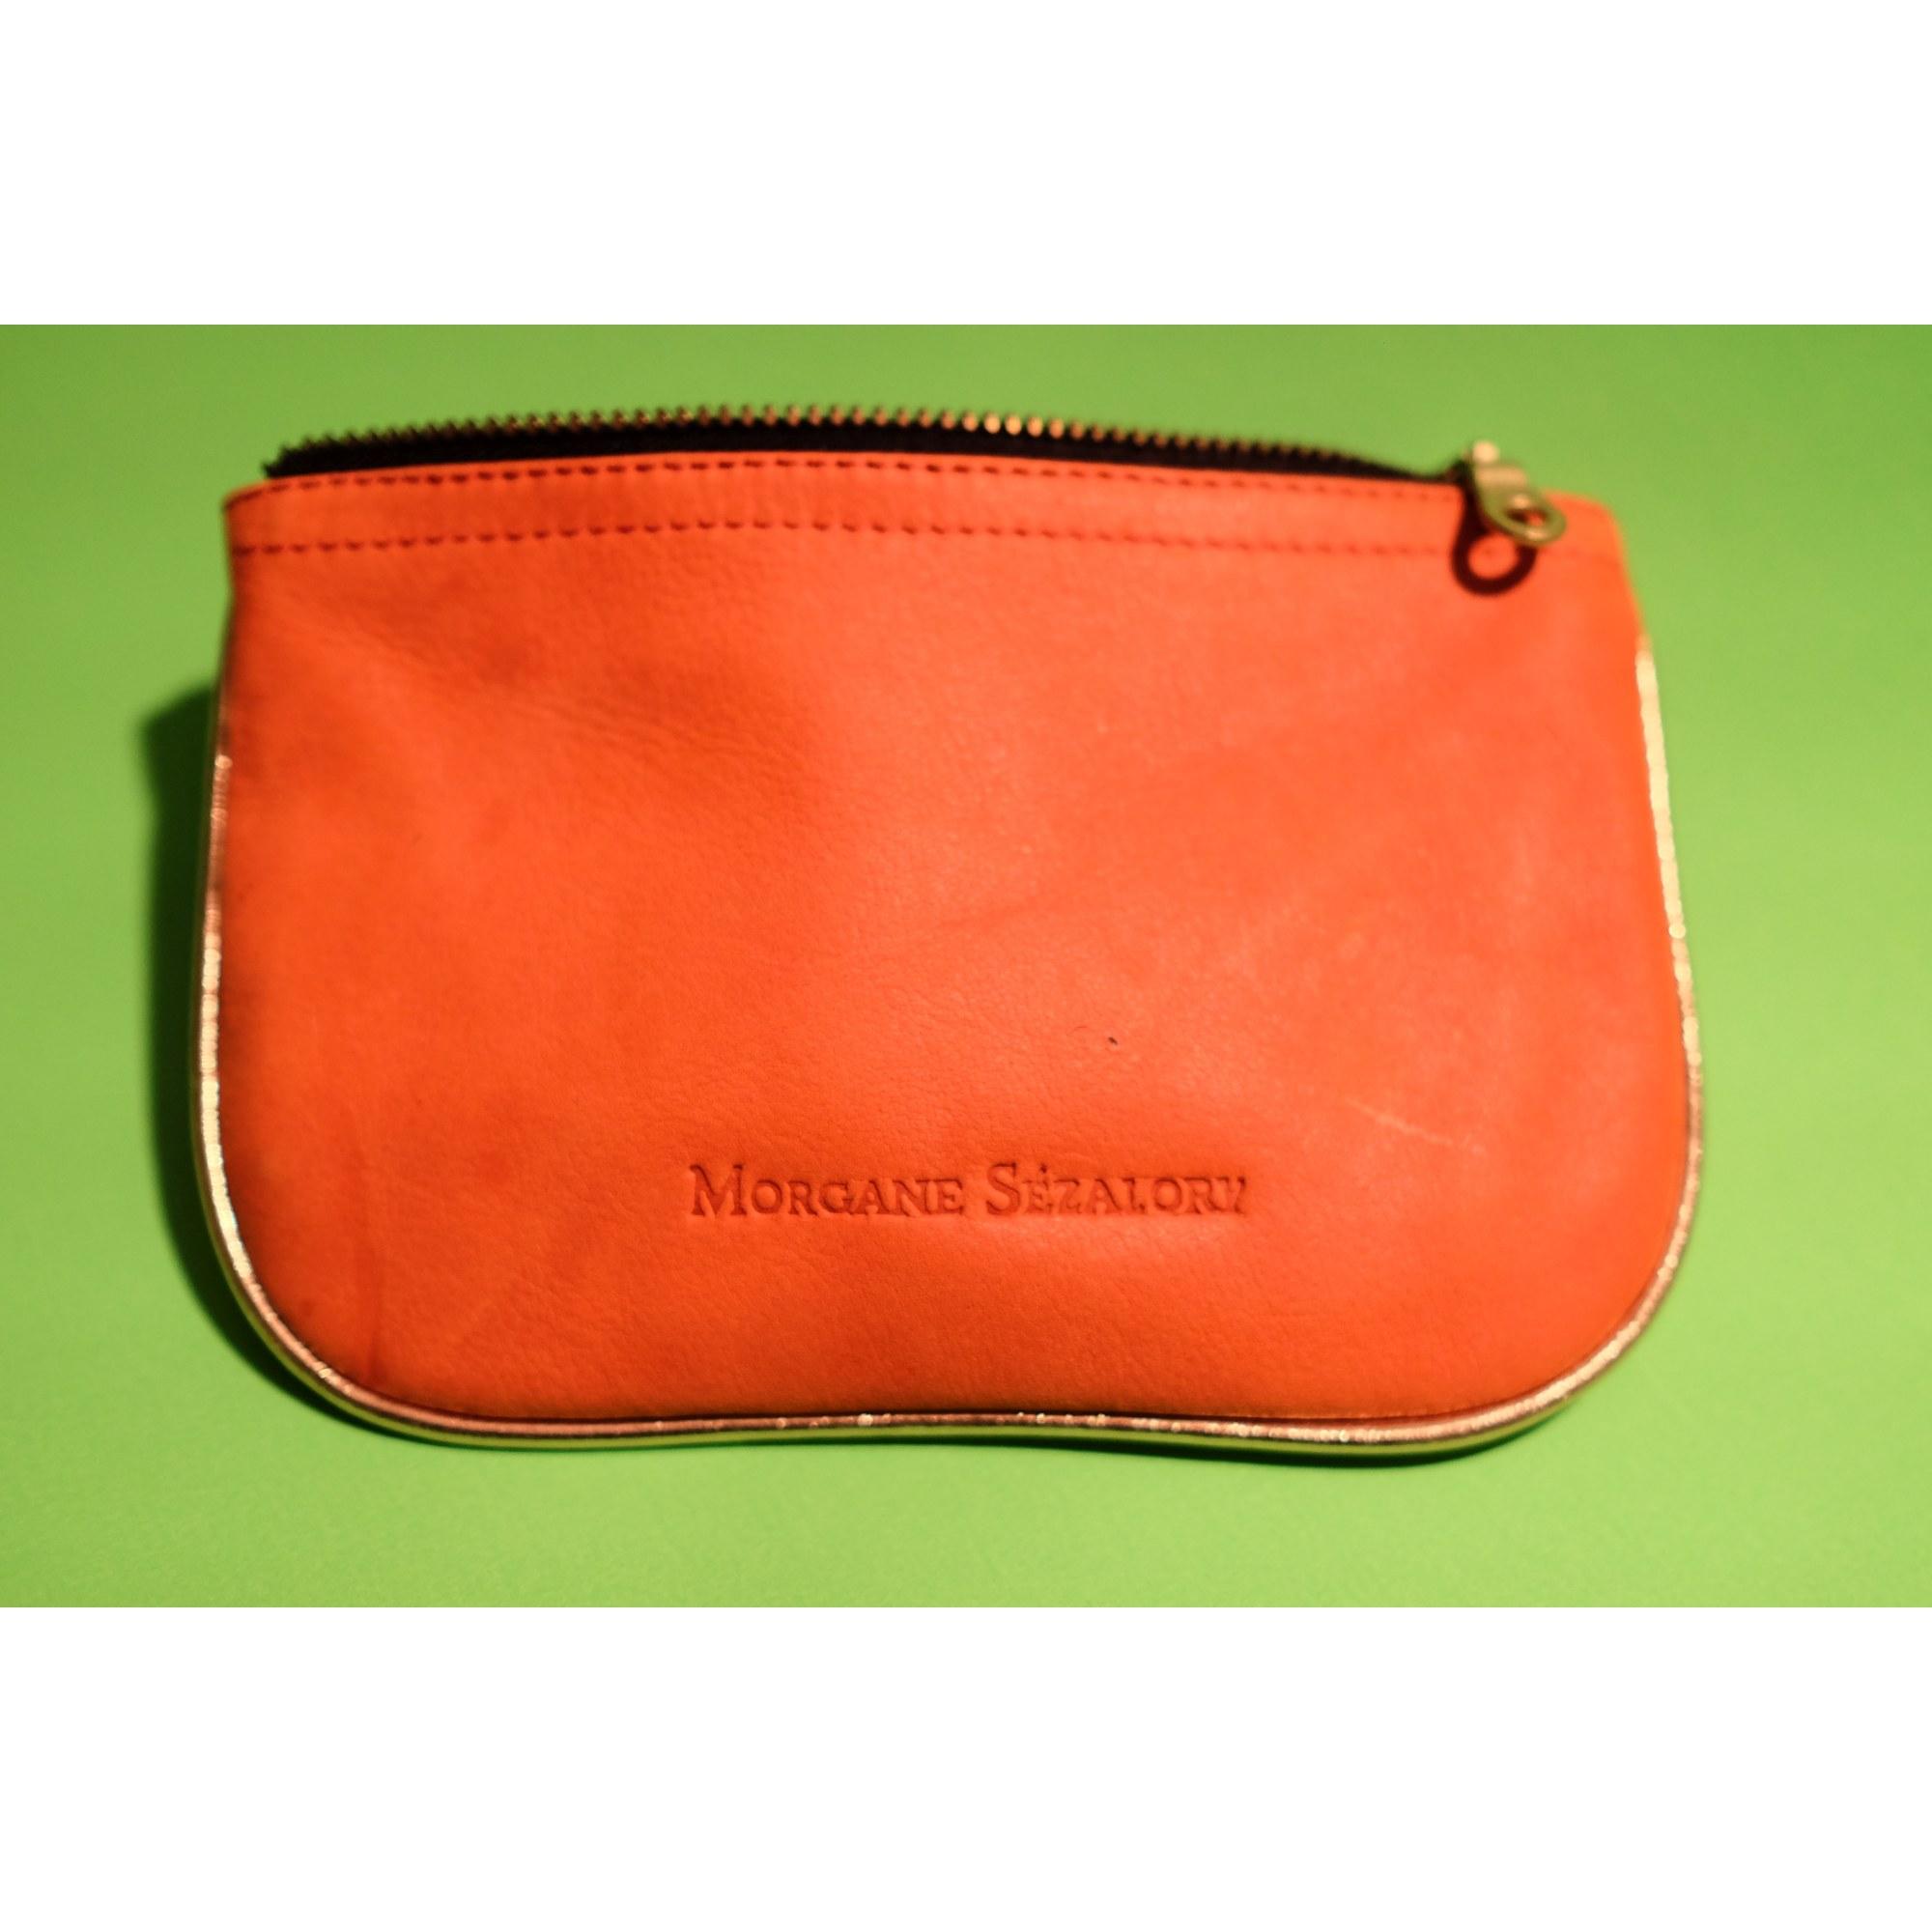 Porte-monnaie SÉZANE cuir orange